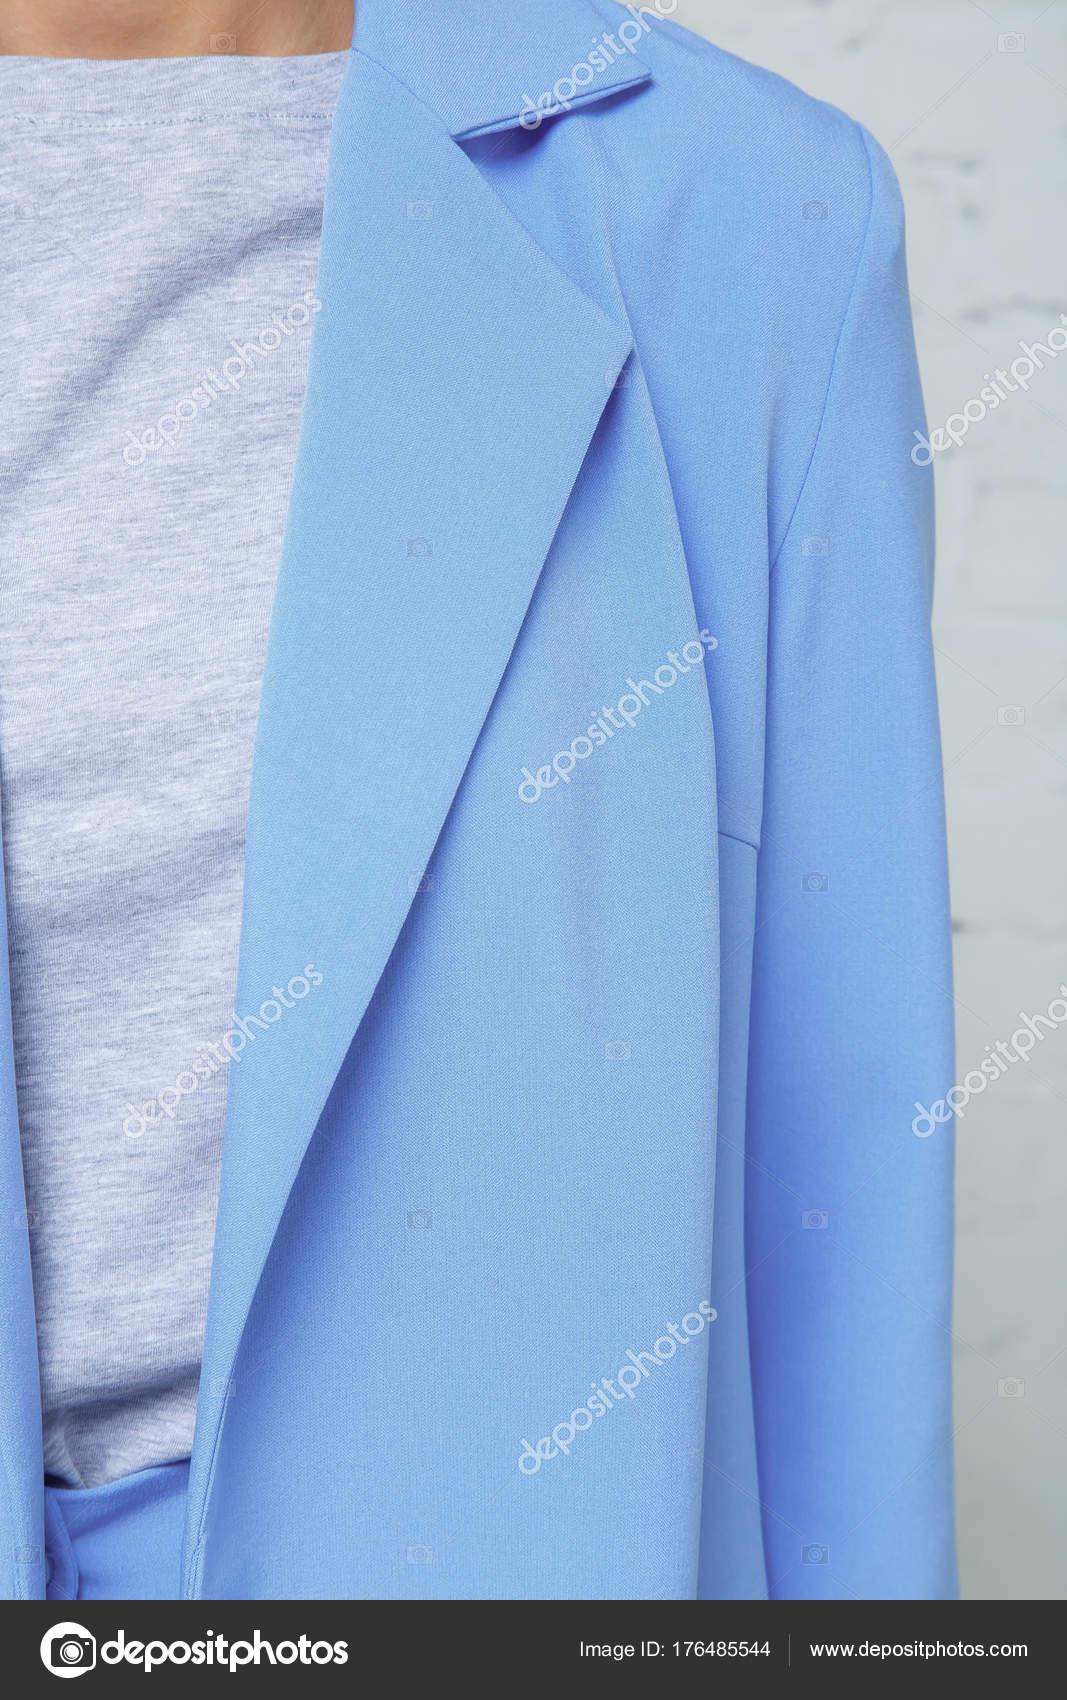 76d0a3ba6f35 Λεπτομέρειες για την γυναικεία ένδυση. Όμορφα casual γυναικεία μπουφάν  μόδας — Φωτογραφία Αρχείου